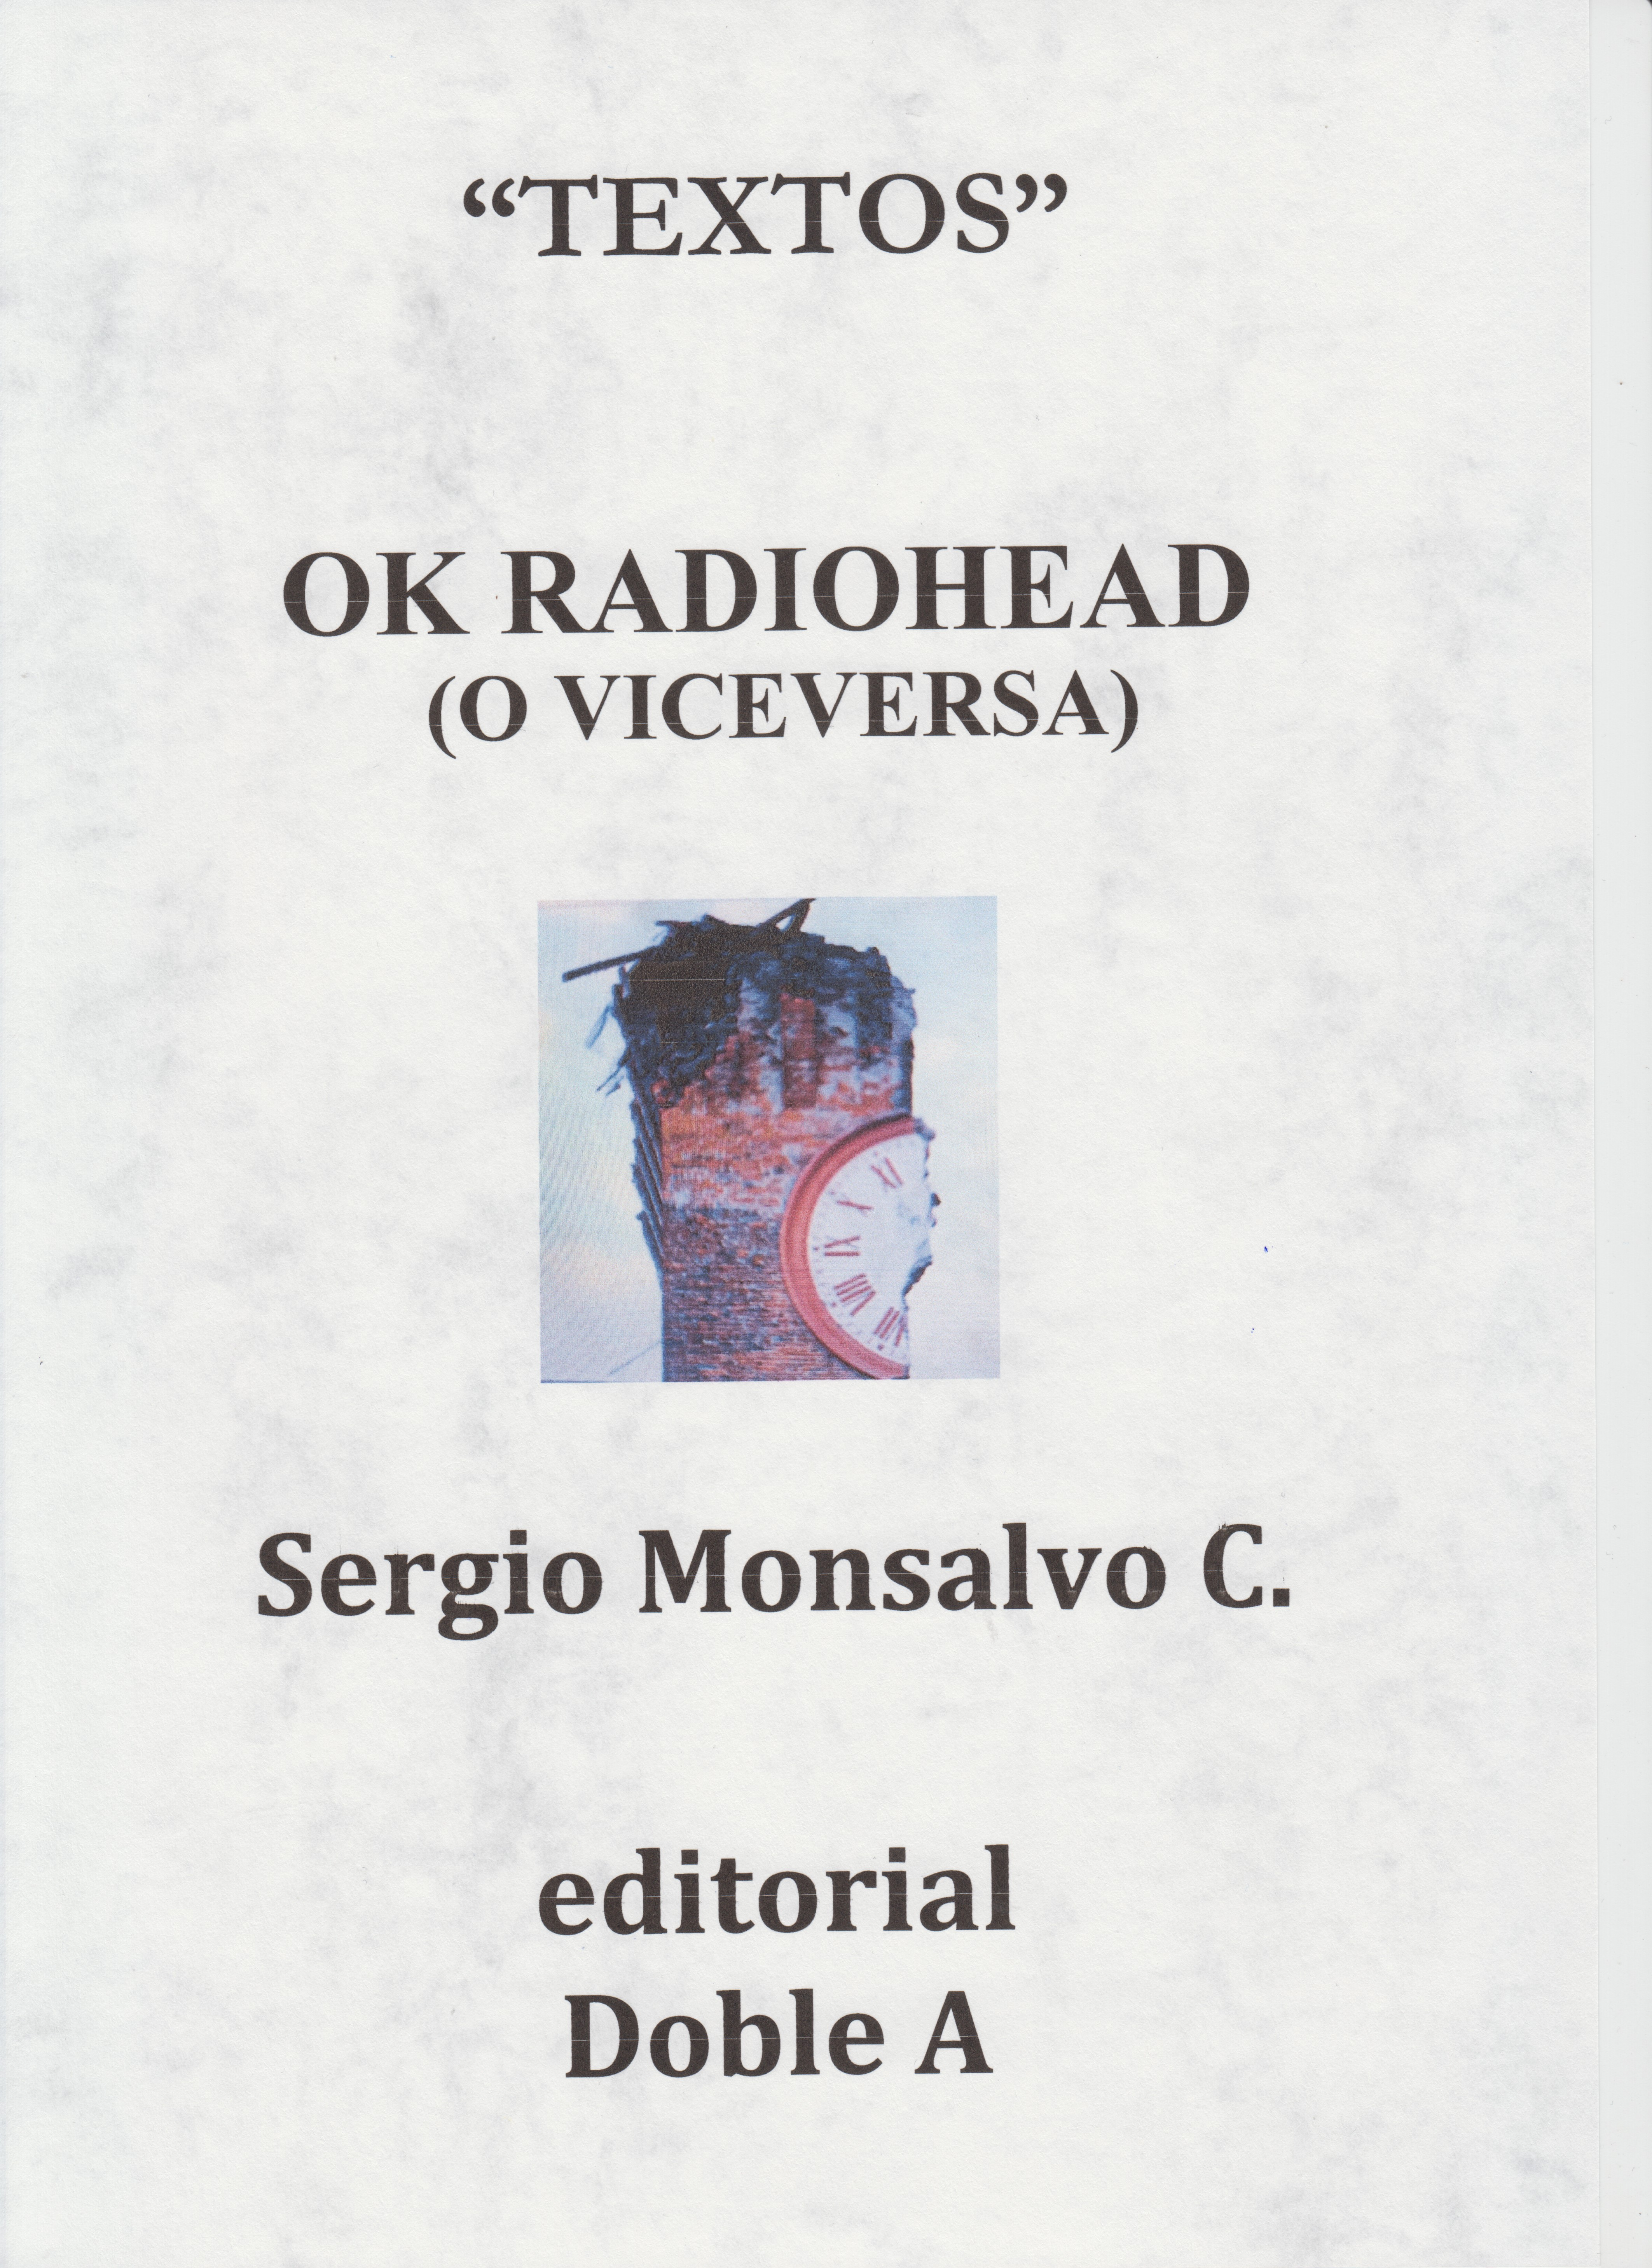 OK RADIOHEAD (PORTADA)